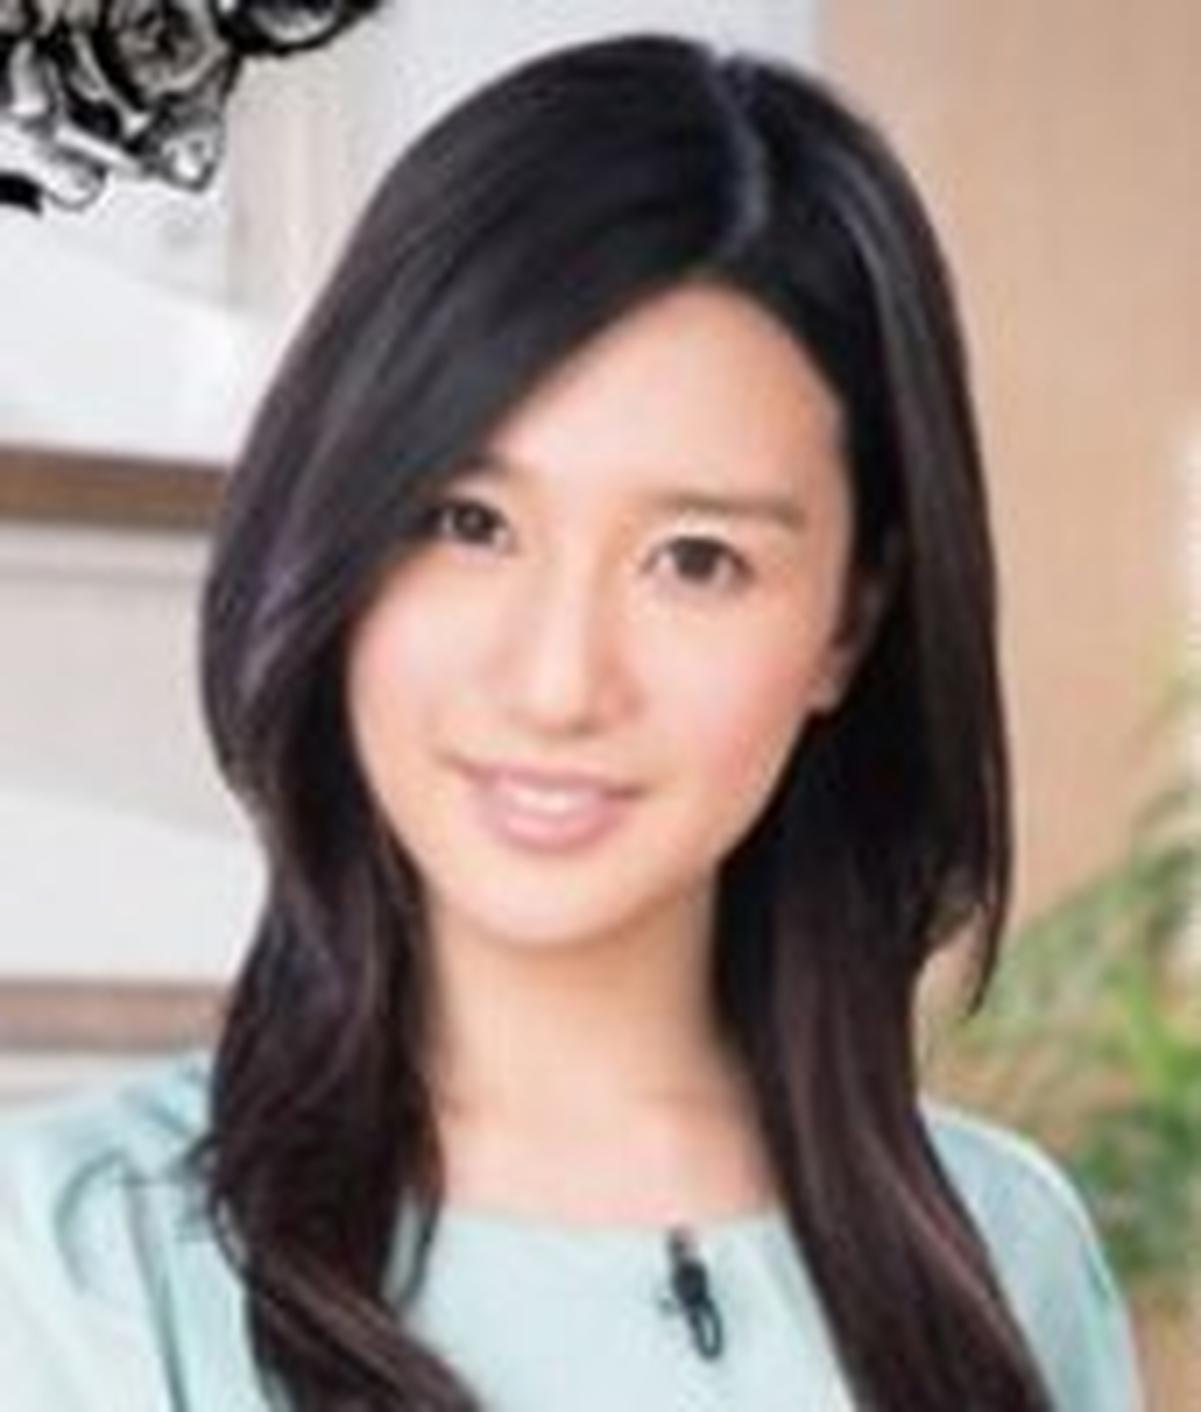 Iori Furukawa